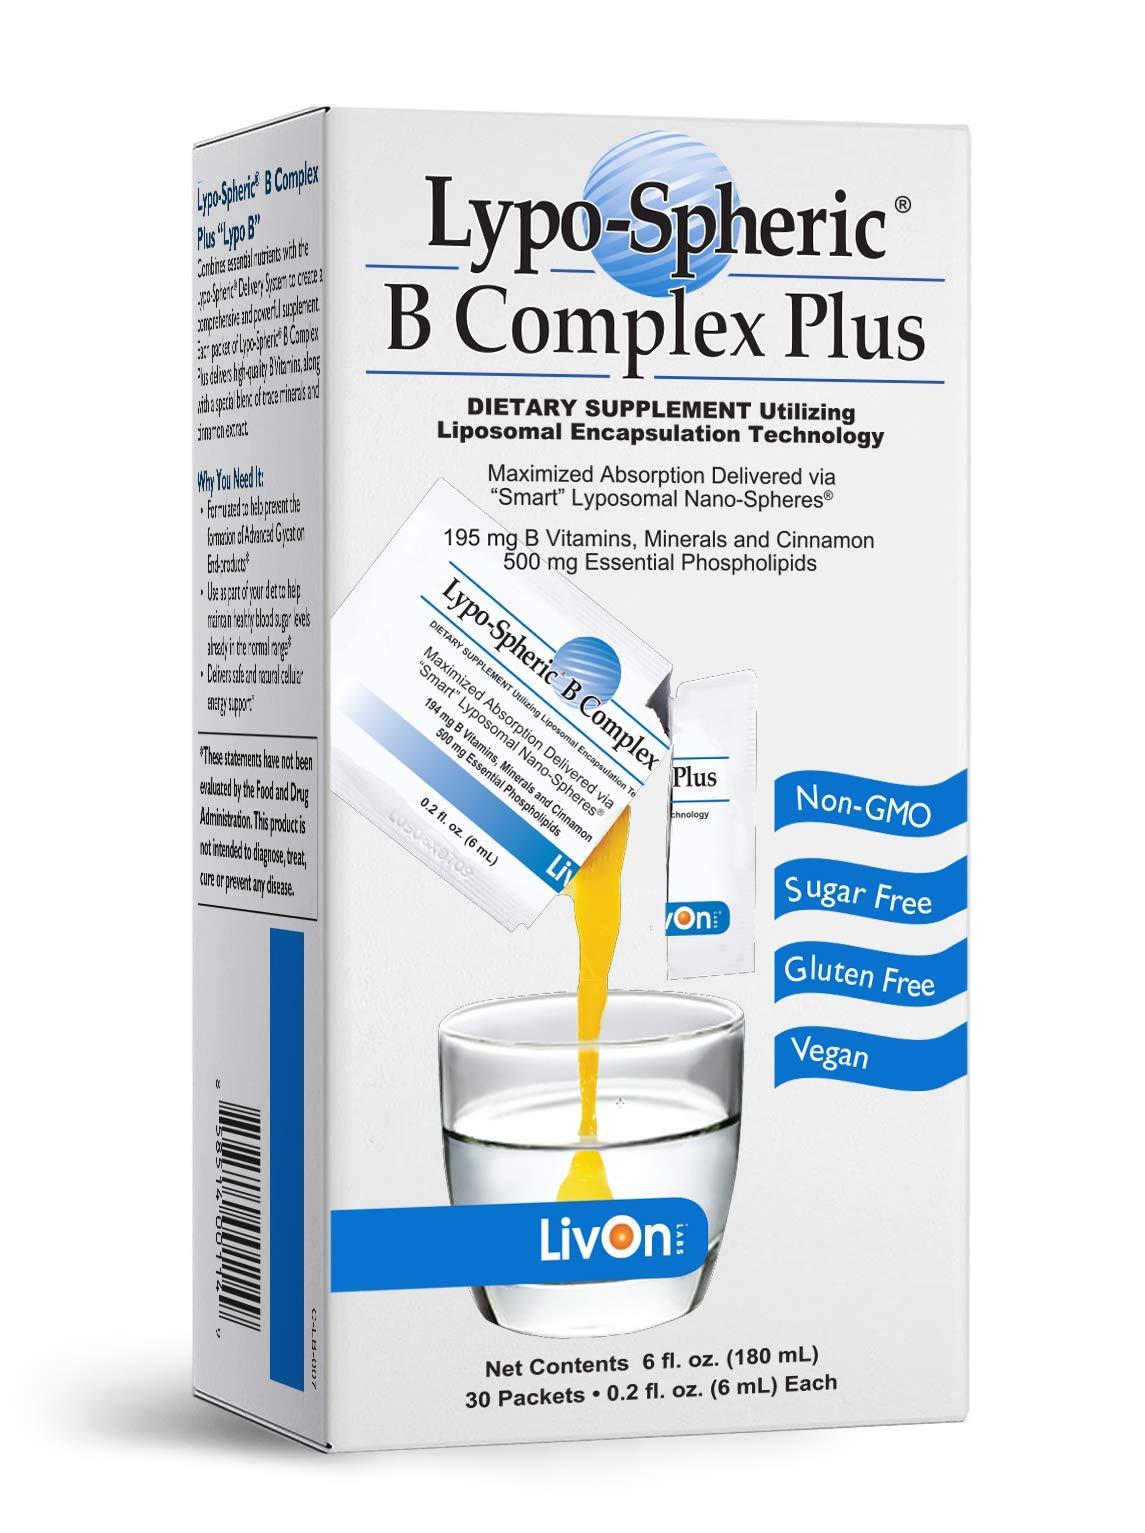 Lypo-Spheric B Complex Plus – 30 Packets – 195 mg B Vitamins, Minerals & Cinnamon Per Packet – Liposome Encapsulated for Maximum Bioavailability – Non-GMO Essential Phospholipids